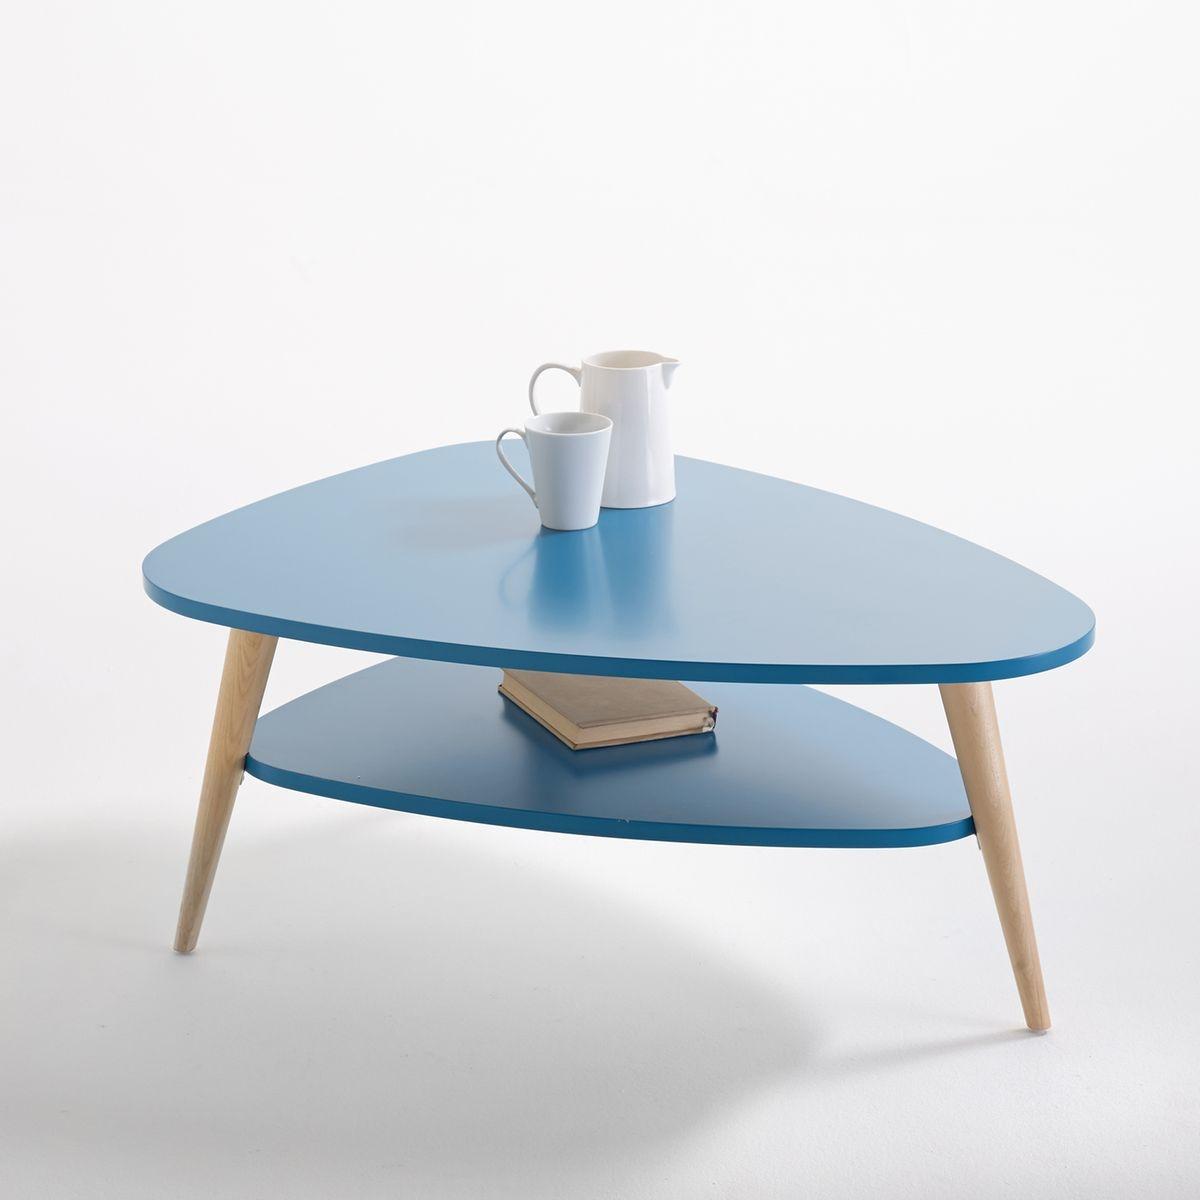 table console la redoute int rieurs jusqu 60. Black Bedroom Furniture Sets. Home Design Ideas